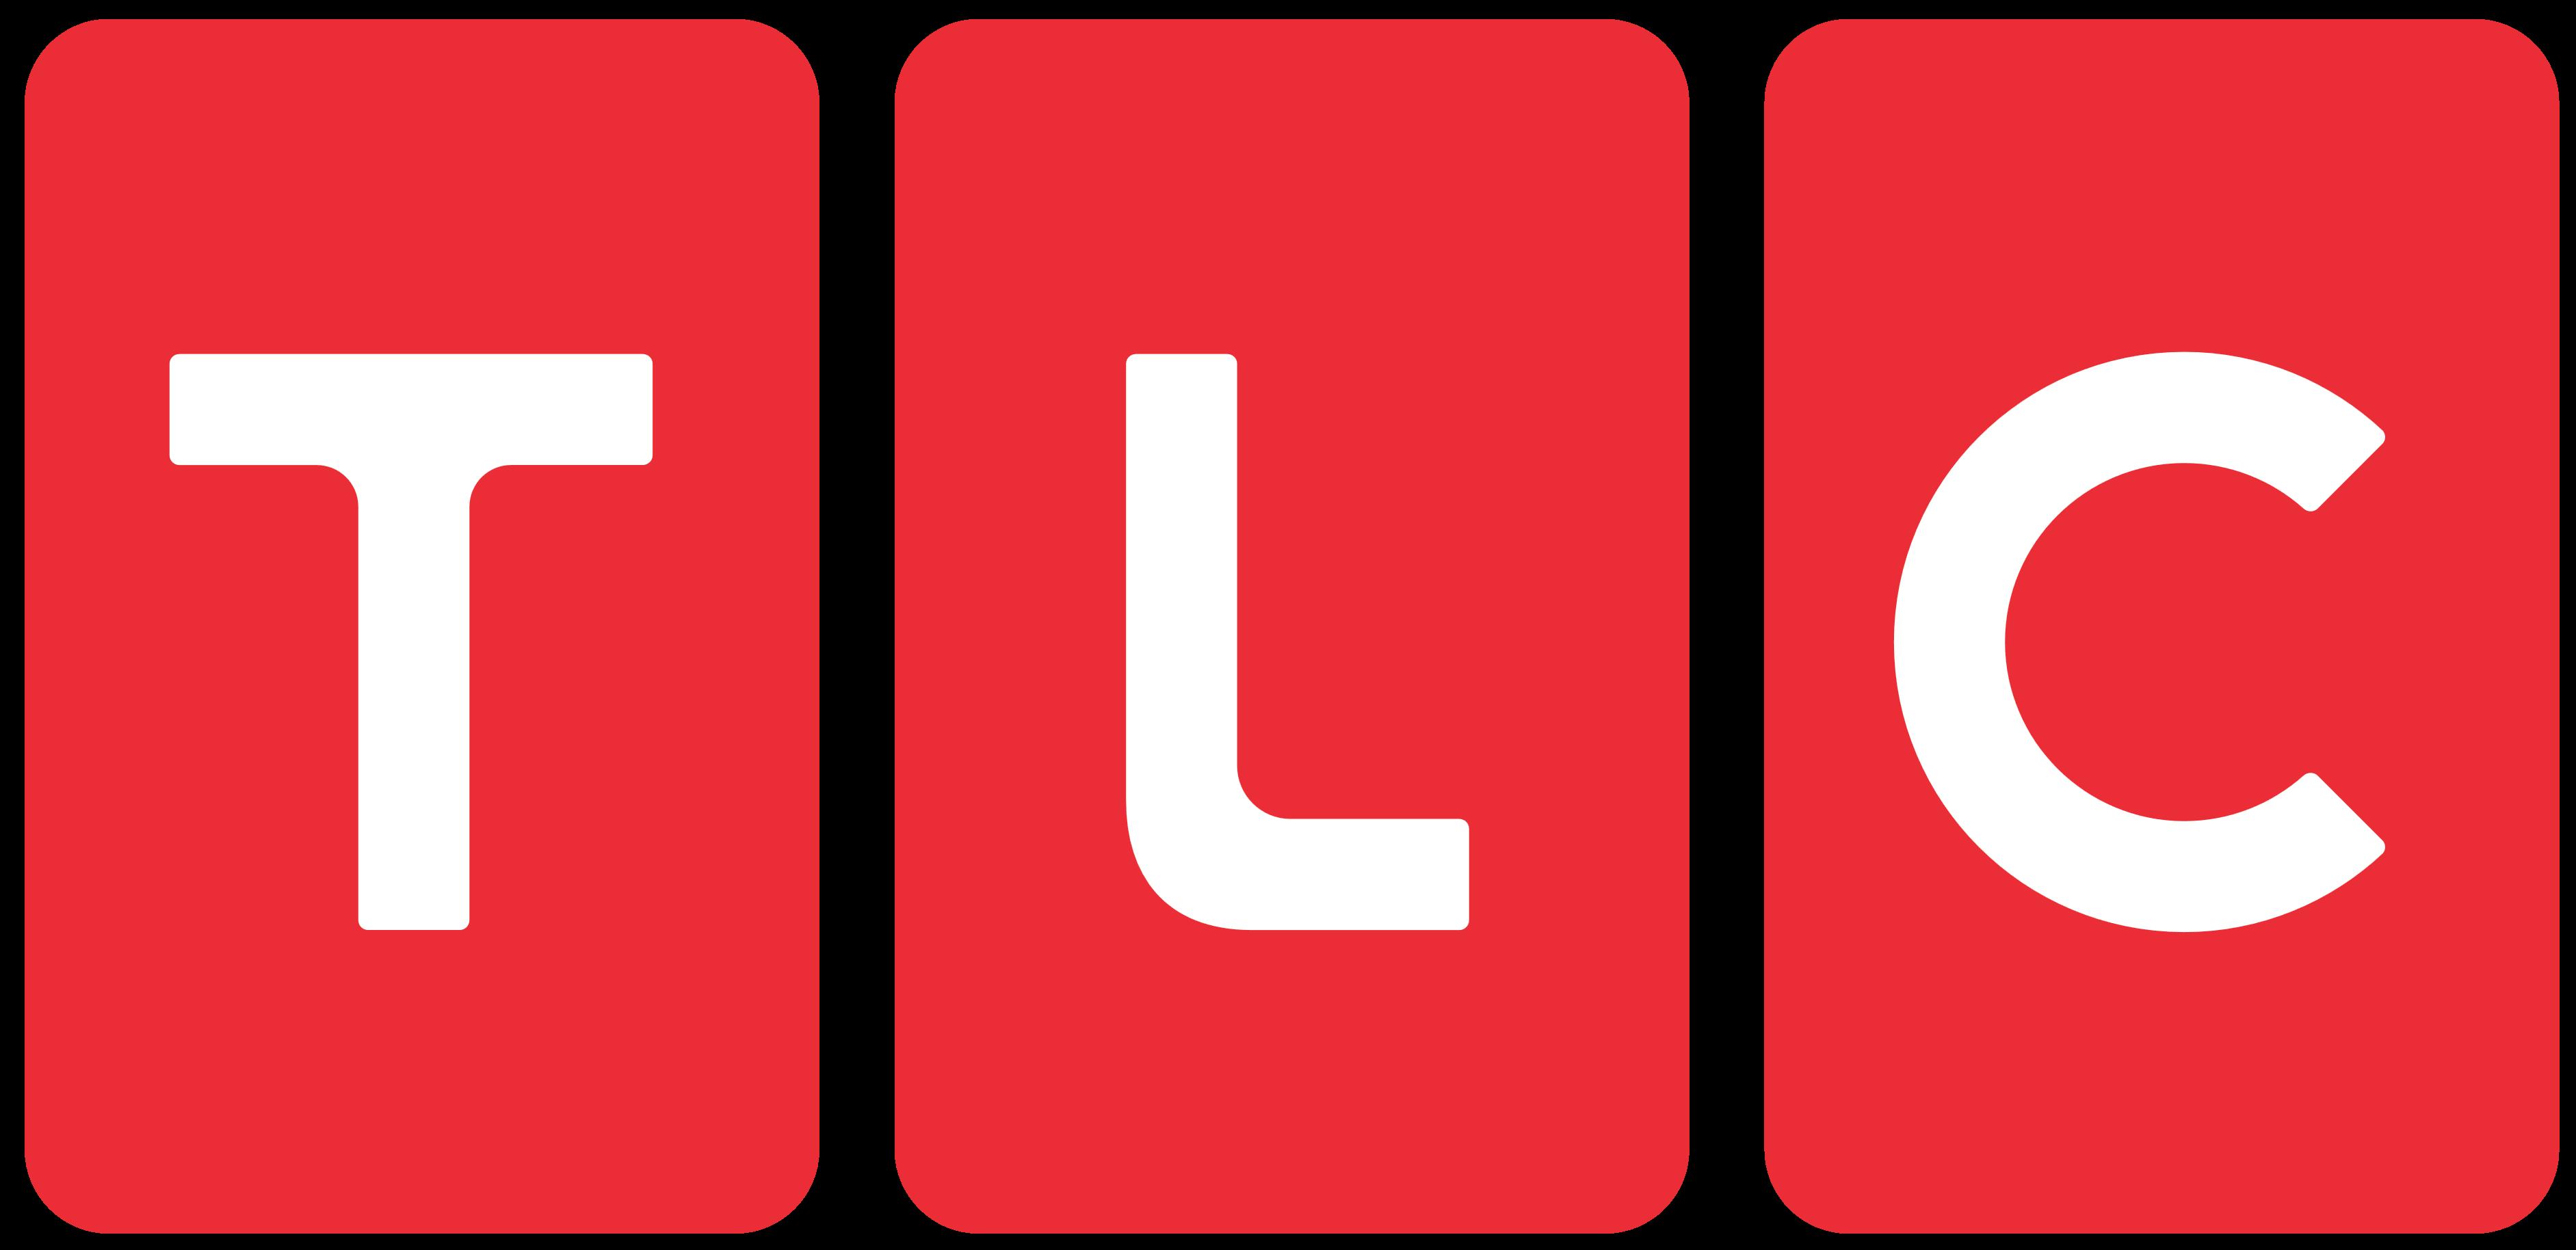 http://aimeecastle.com/wp-content/uploads/2020/07/TLC_logo.png